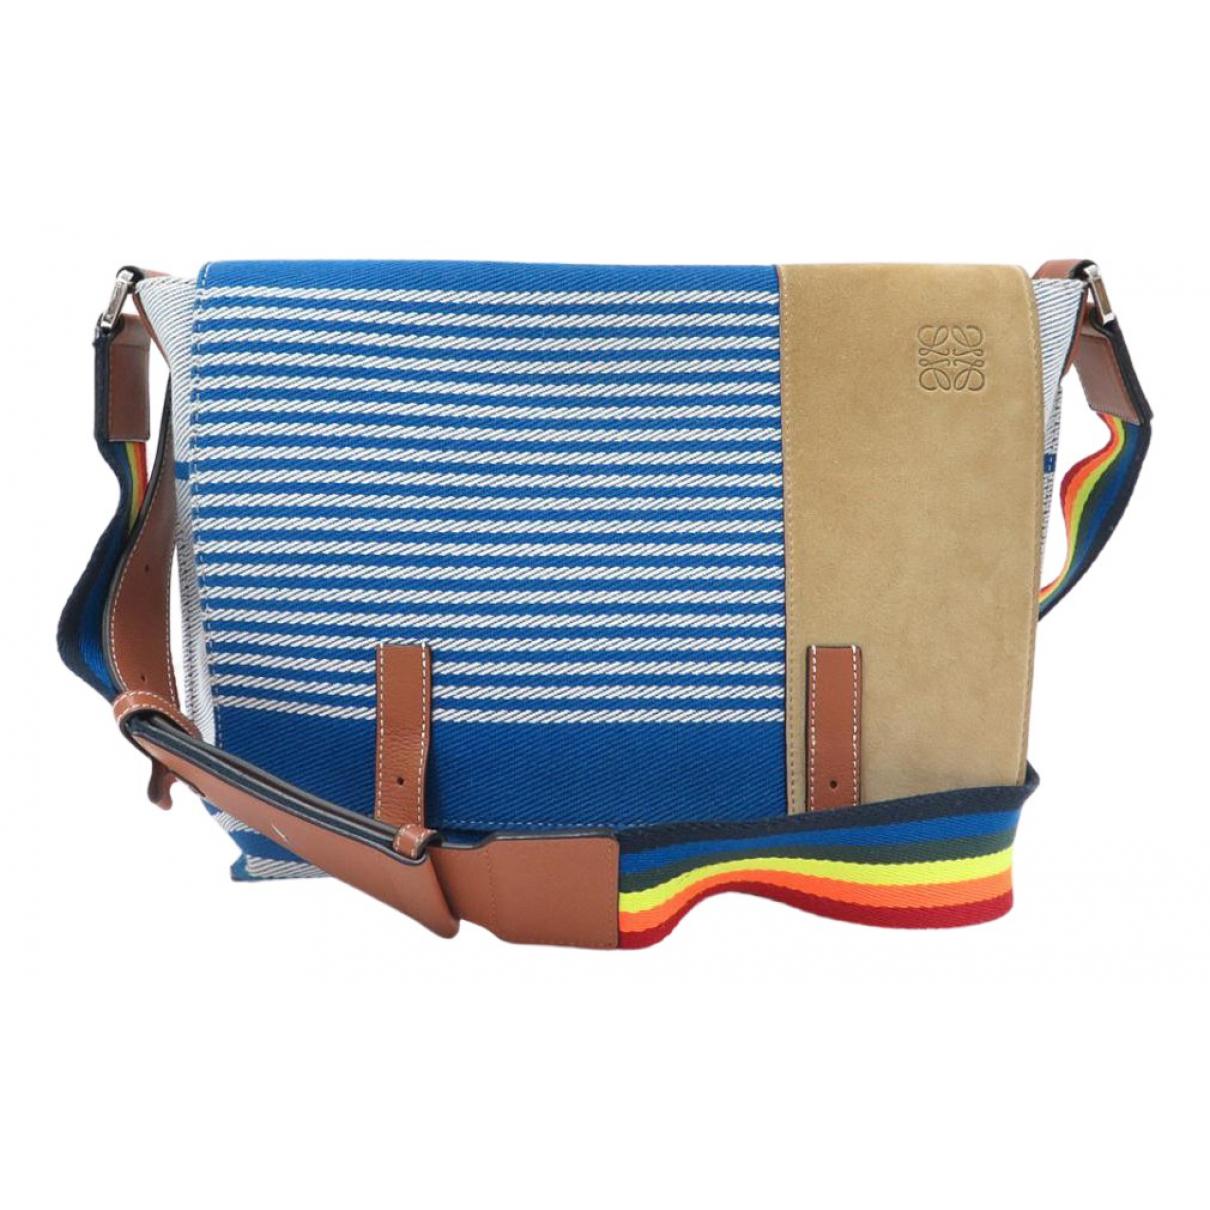 Loewe \N Handtasche in  Bunt Baumwolle